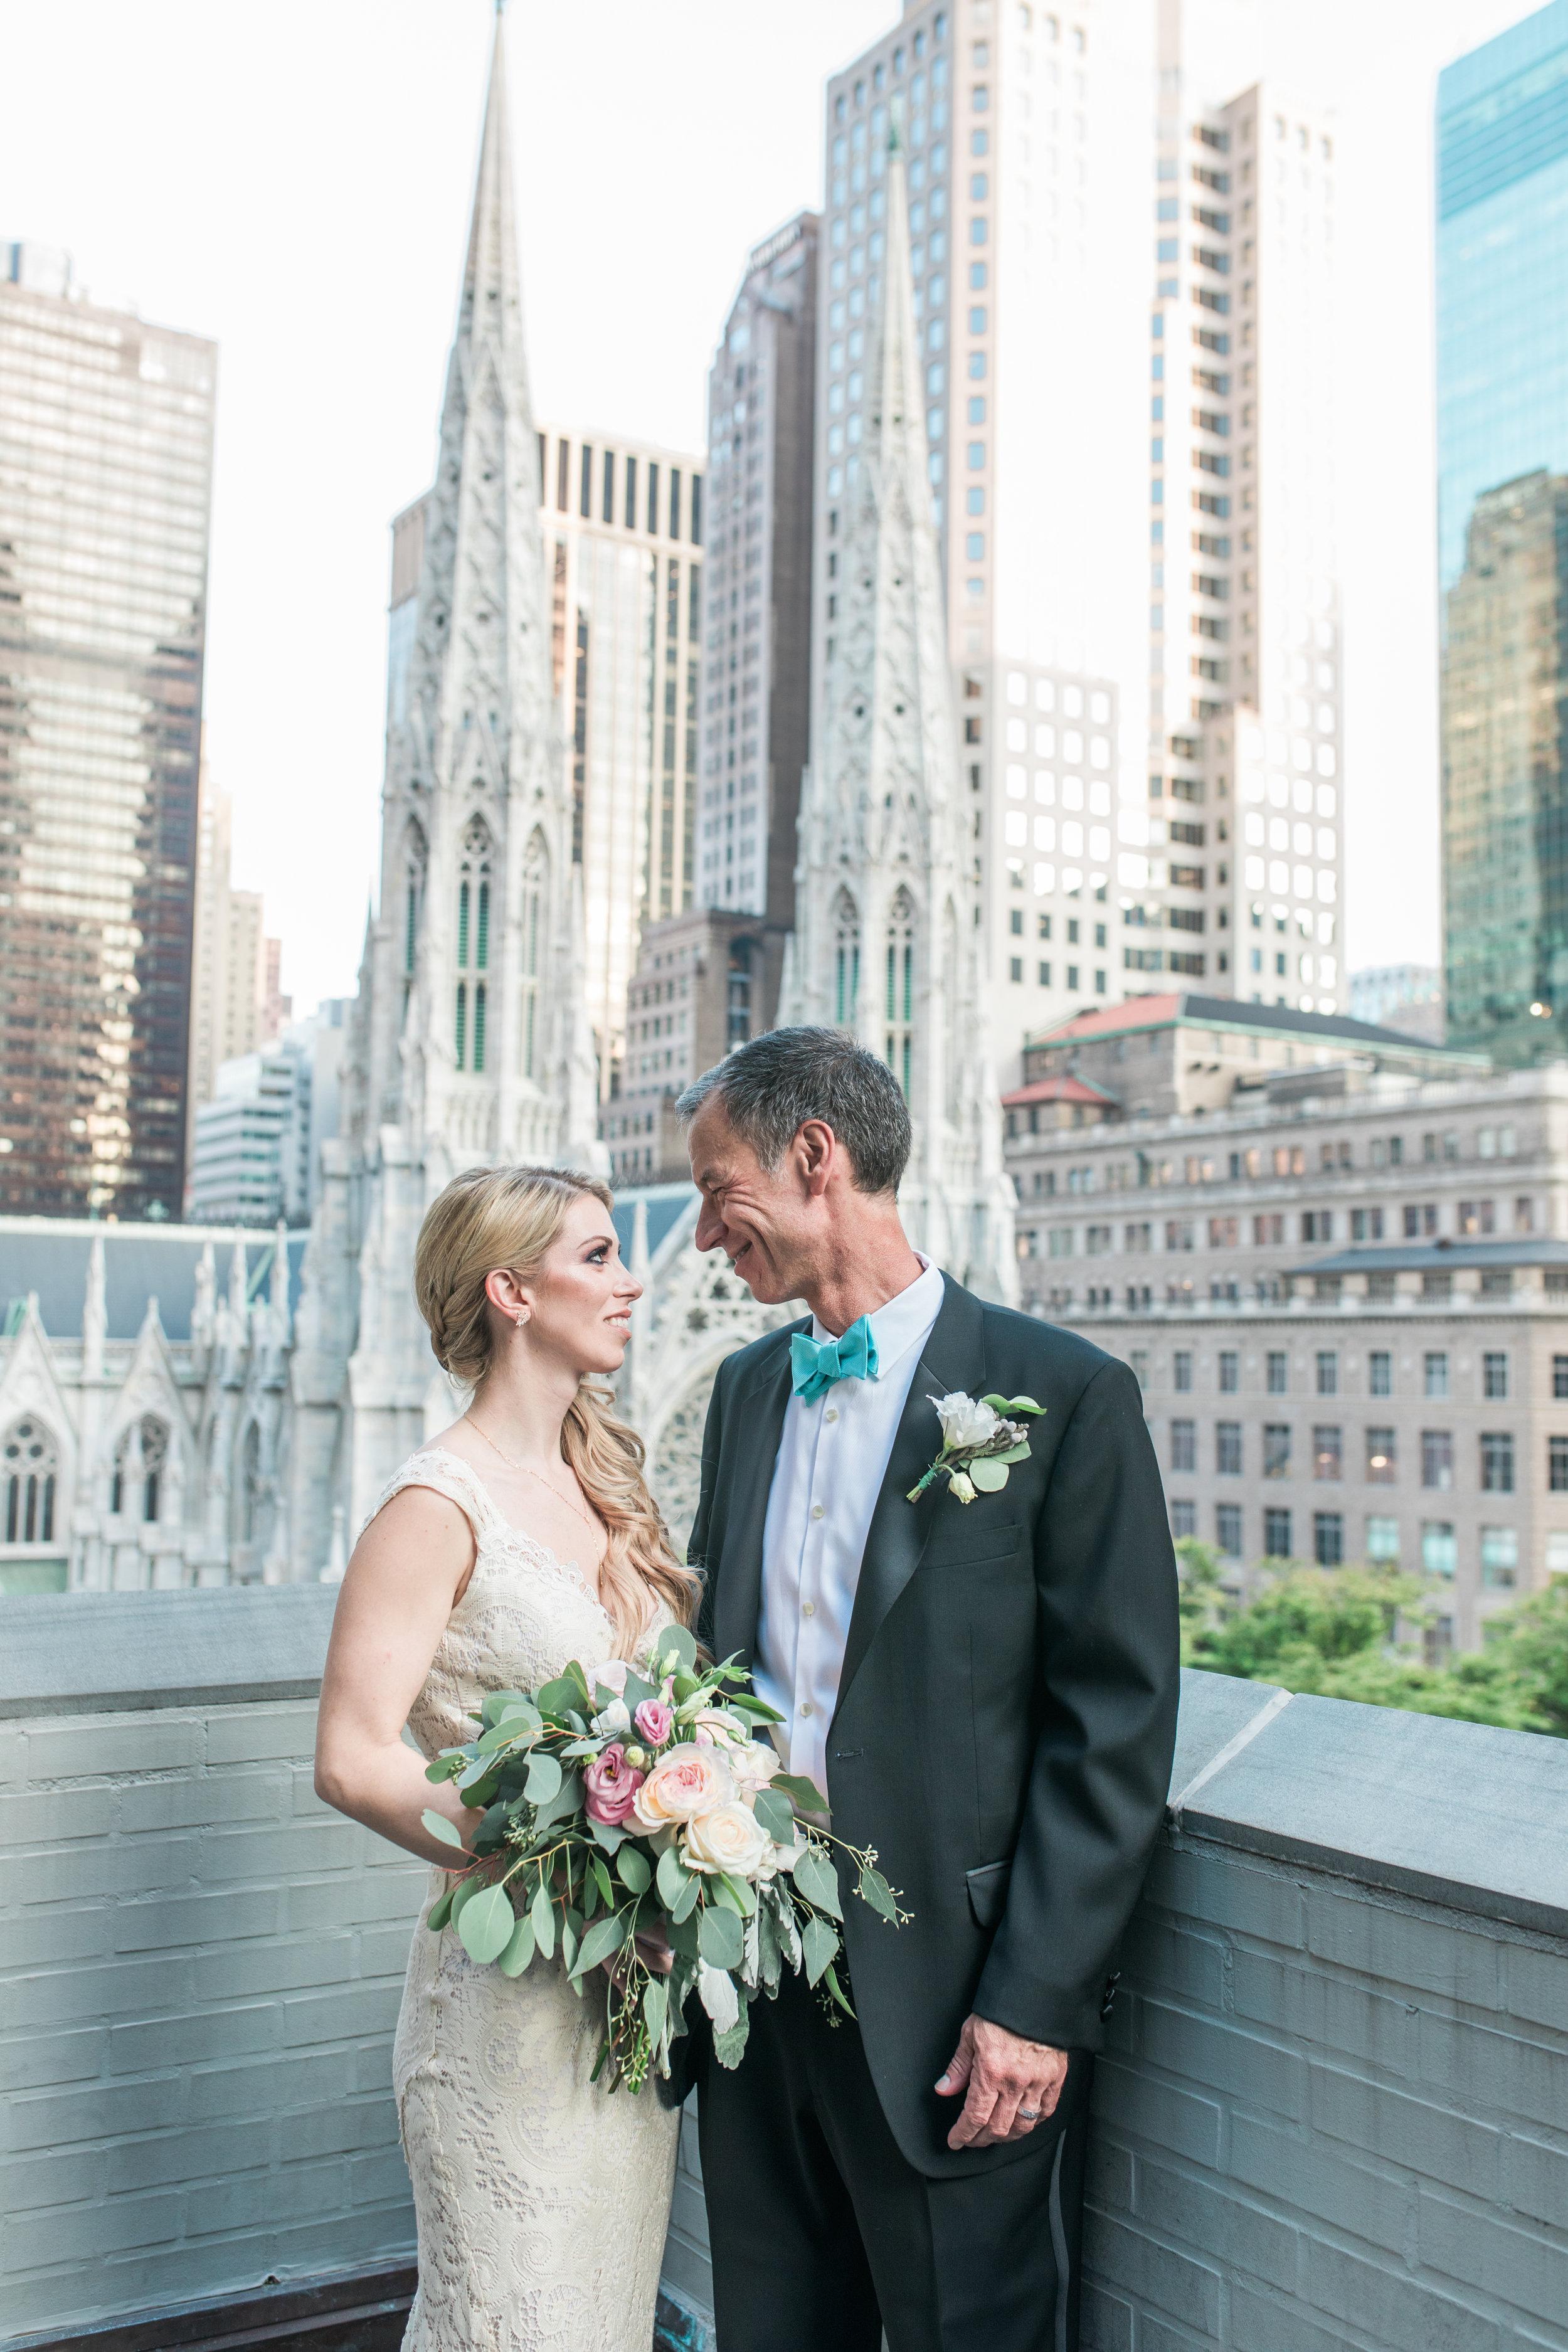 jess_palatucci_photography_3_west_club_wedding_new_york_city211.jpg